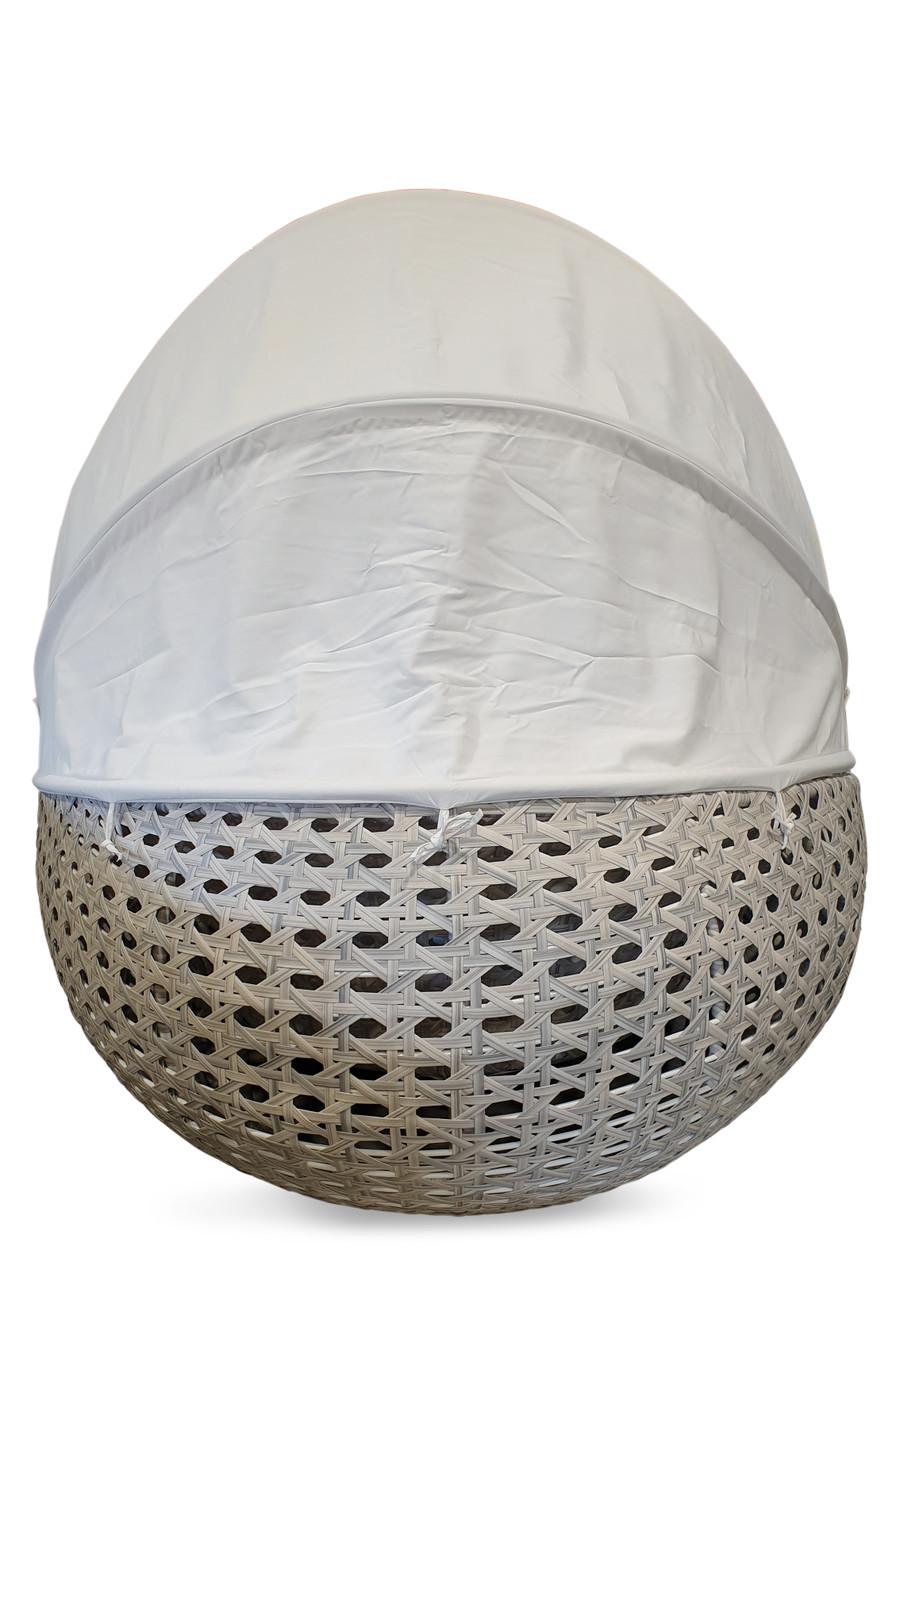 Lovina Outdoor Aluminium Framed Synthetic Wicker Daybed with Sunbrella Canopy